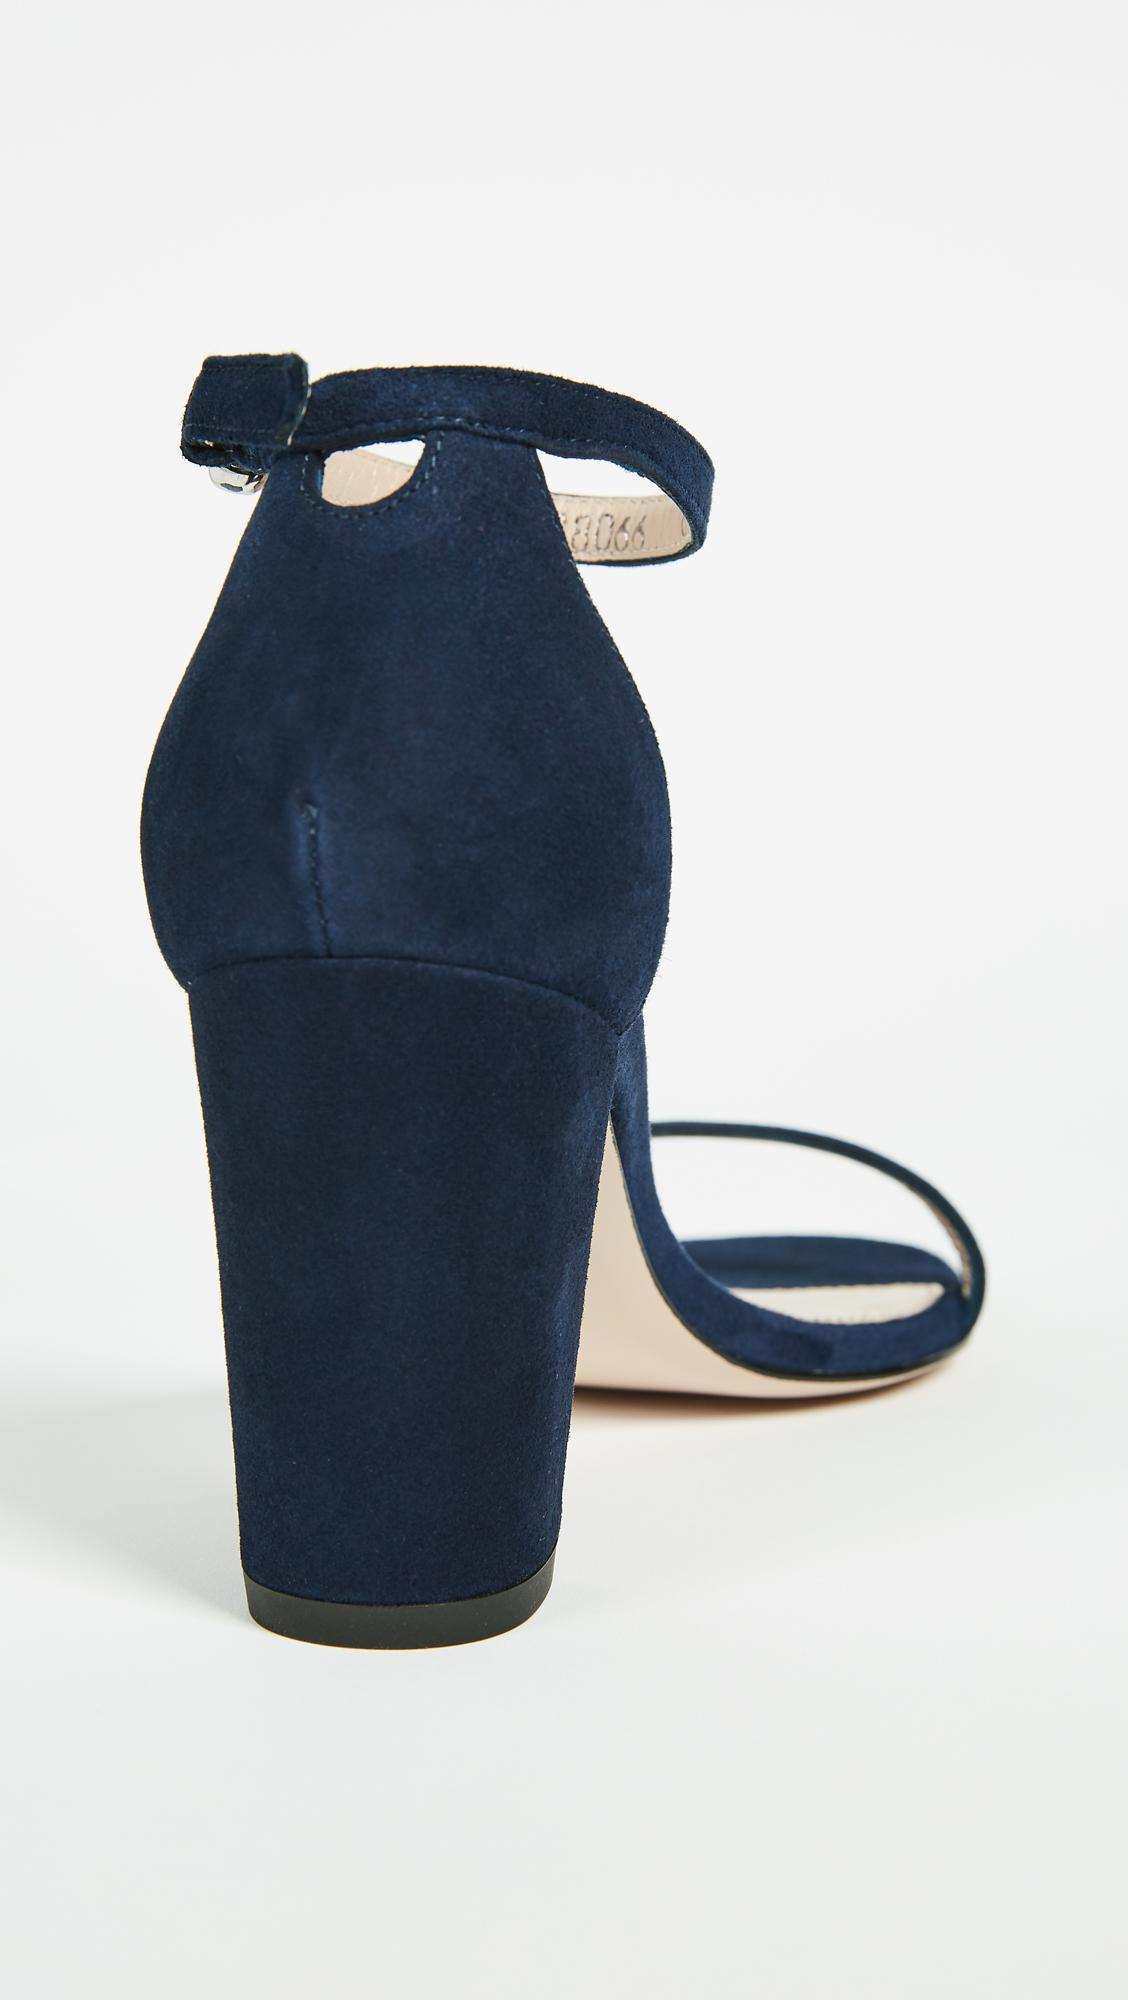 88173b1dac63 Lyst - Stuart Weitzman Nearlynude Sandals in Blue - Save 60%